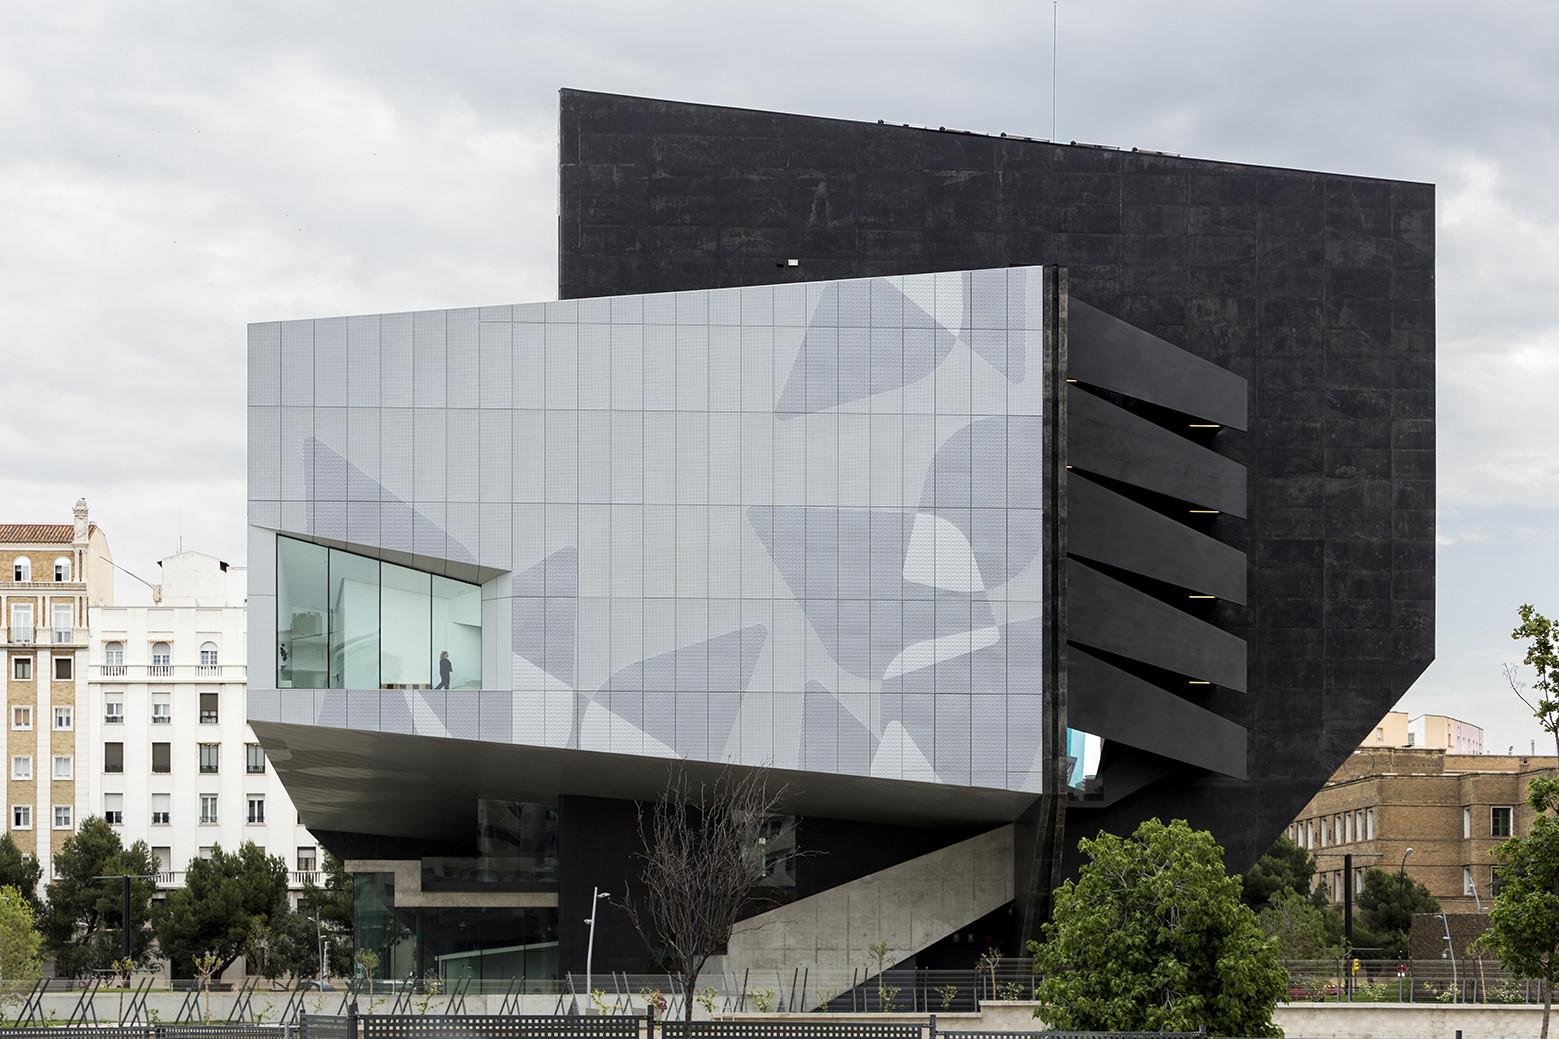 Muebles Hospitalarios Los Pinos - Carme Pinos Tag Plataforma Arquitectura[mjhdah]https://images01.olx-st.com/ui/56/05/98/80/o_1515102254_658a86b9ad10d9f50bb63f5ddf4c485c.jpg